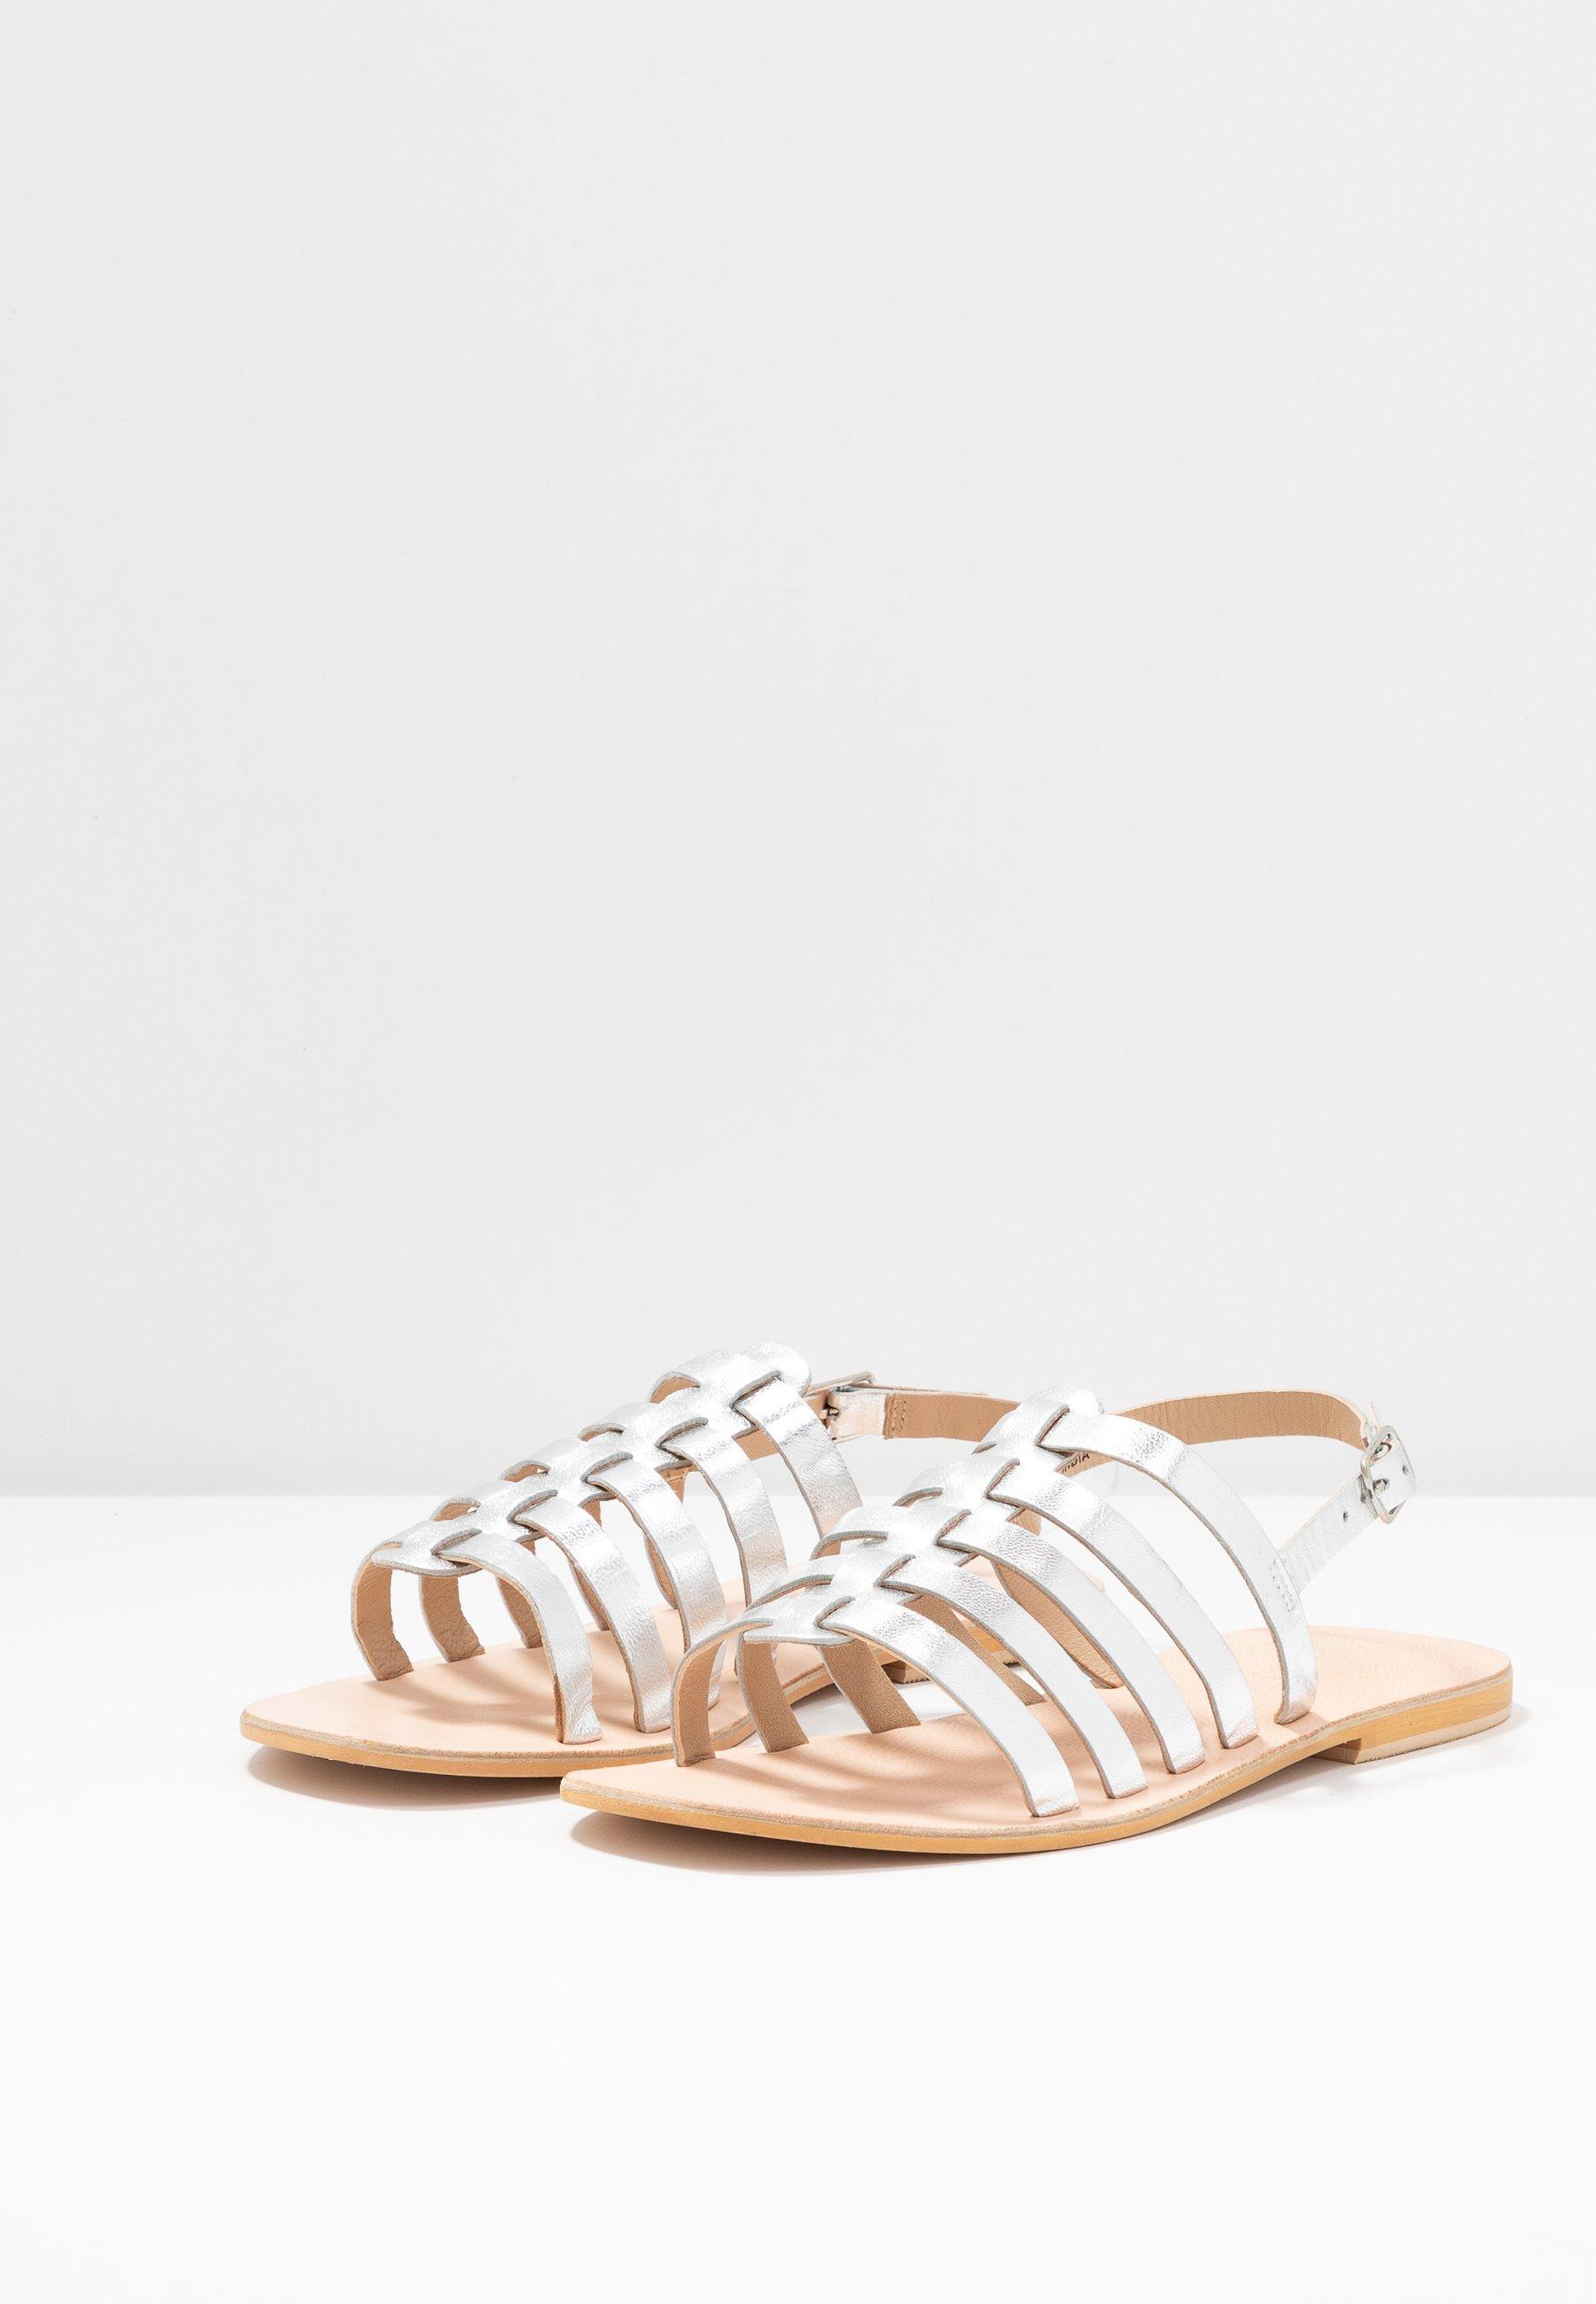 Warehouse Gladiator - Sandals Silver